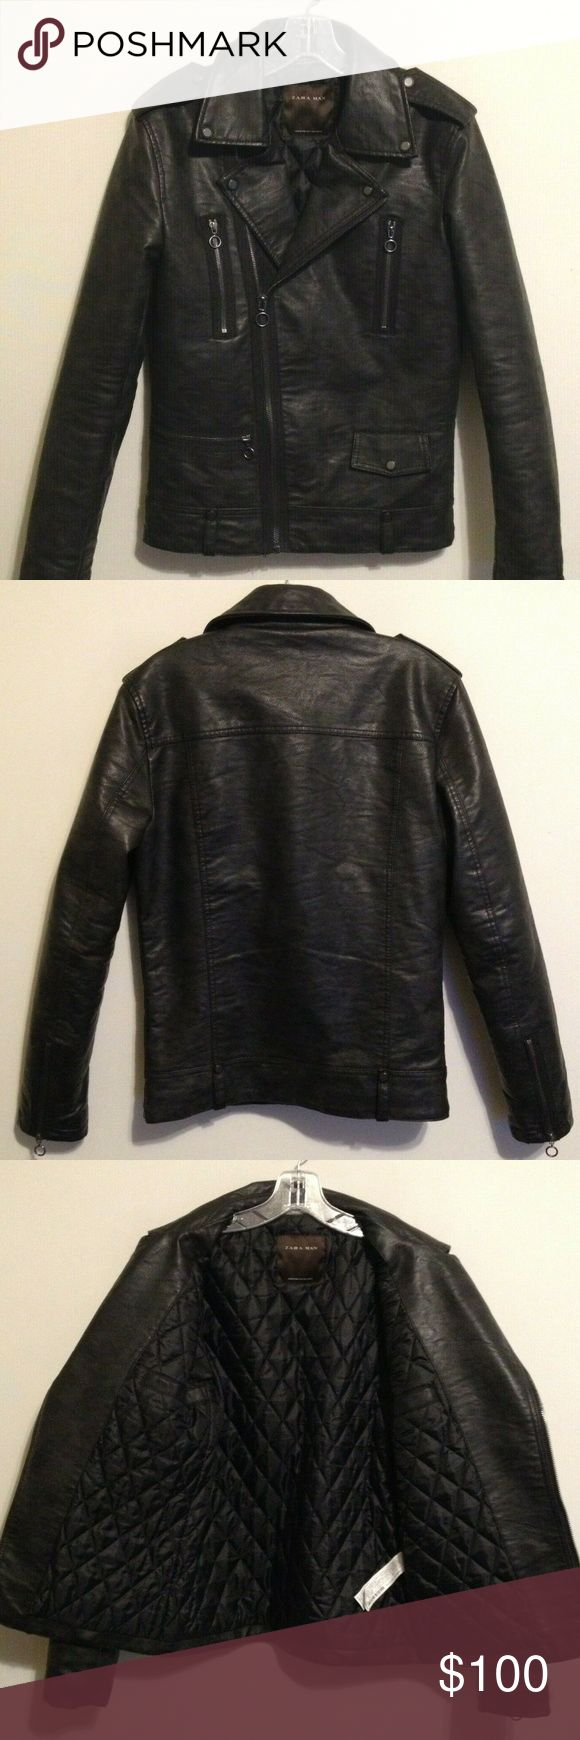 Zara Man Black Faux Leather Motorcycle Jacket S Faux